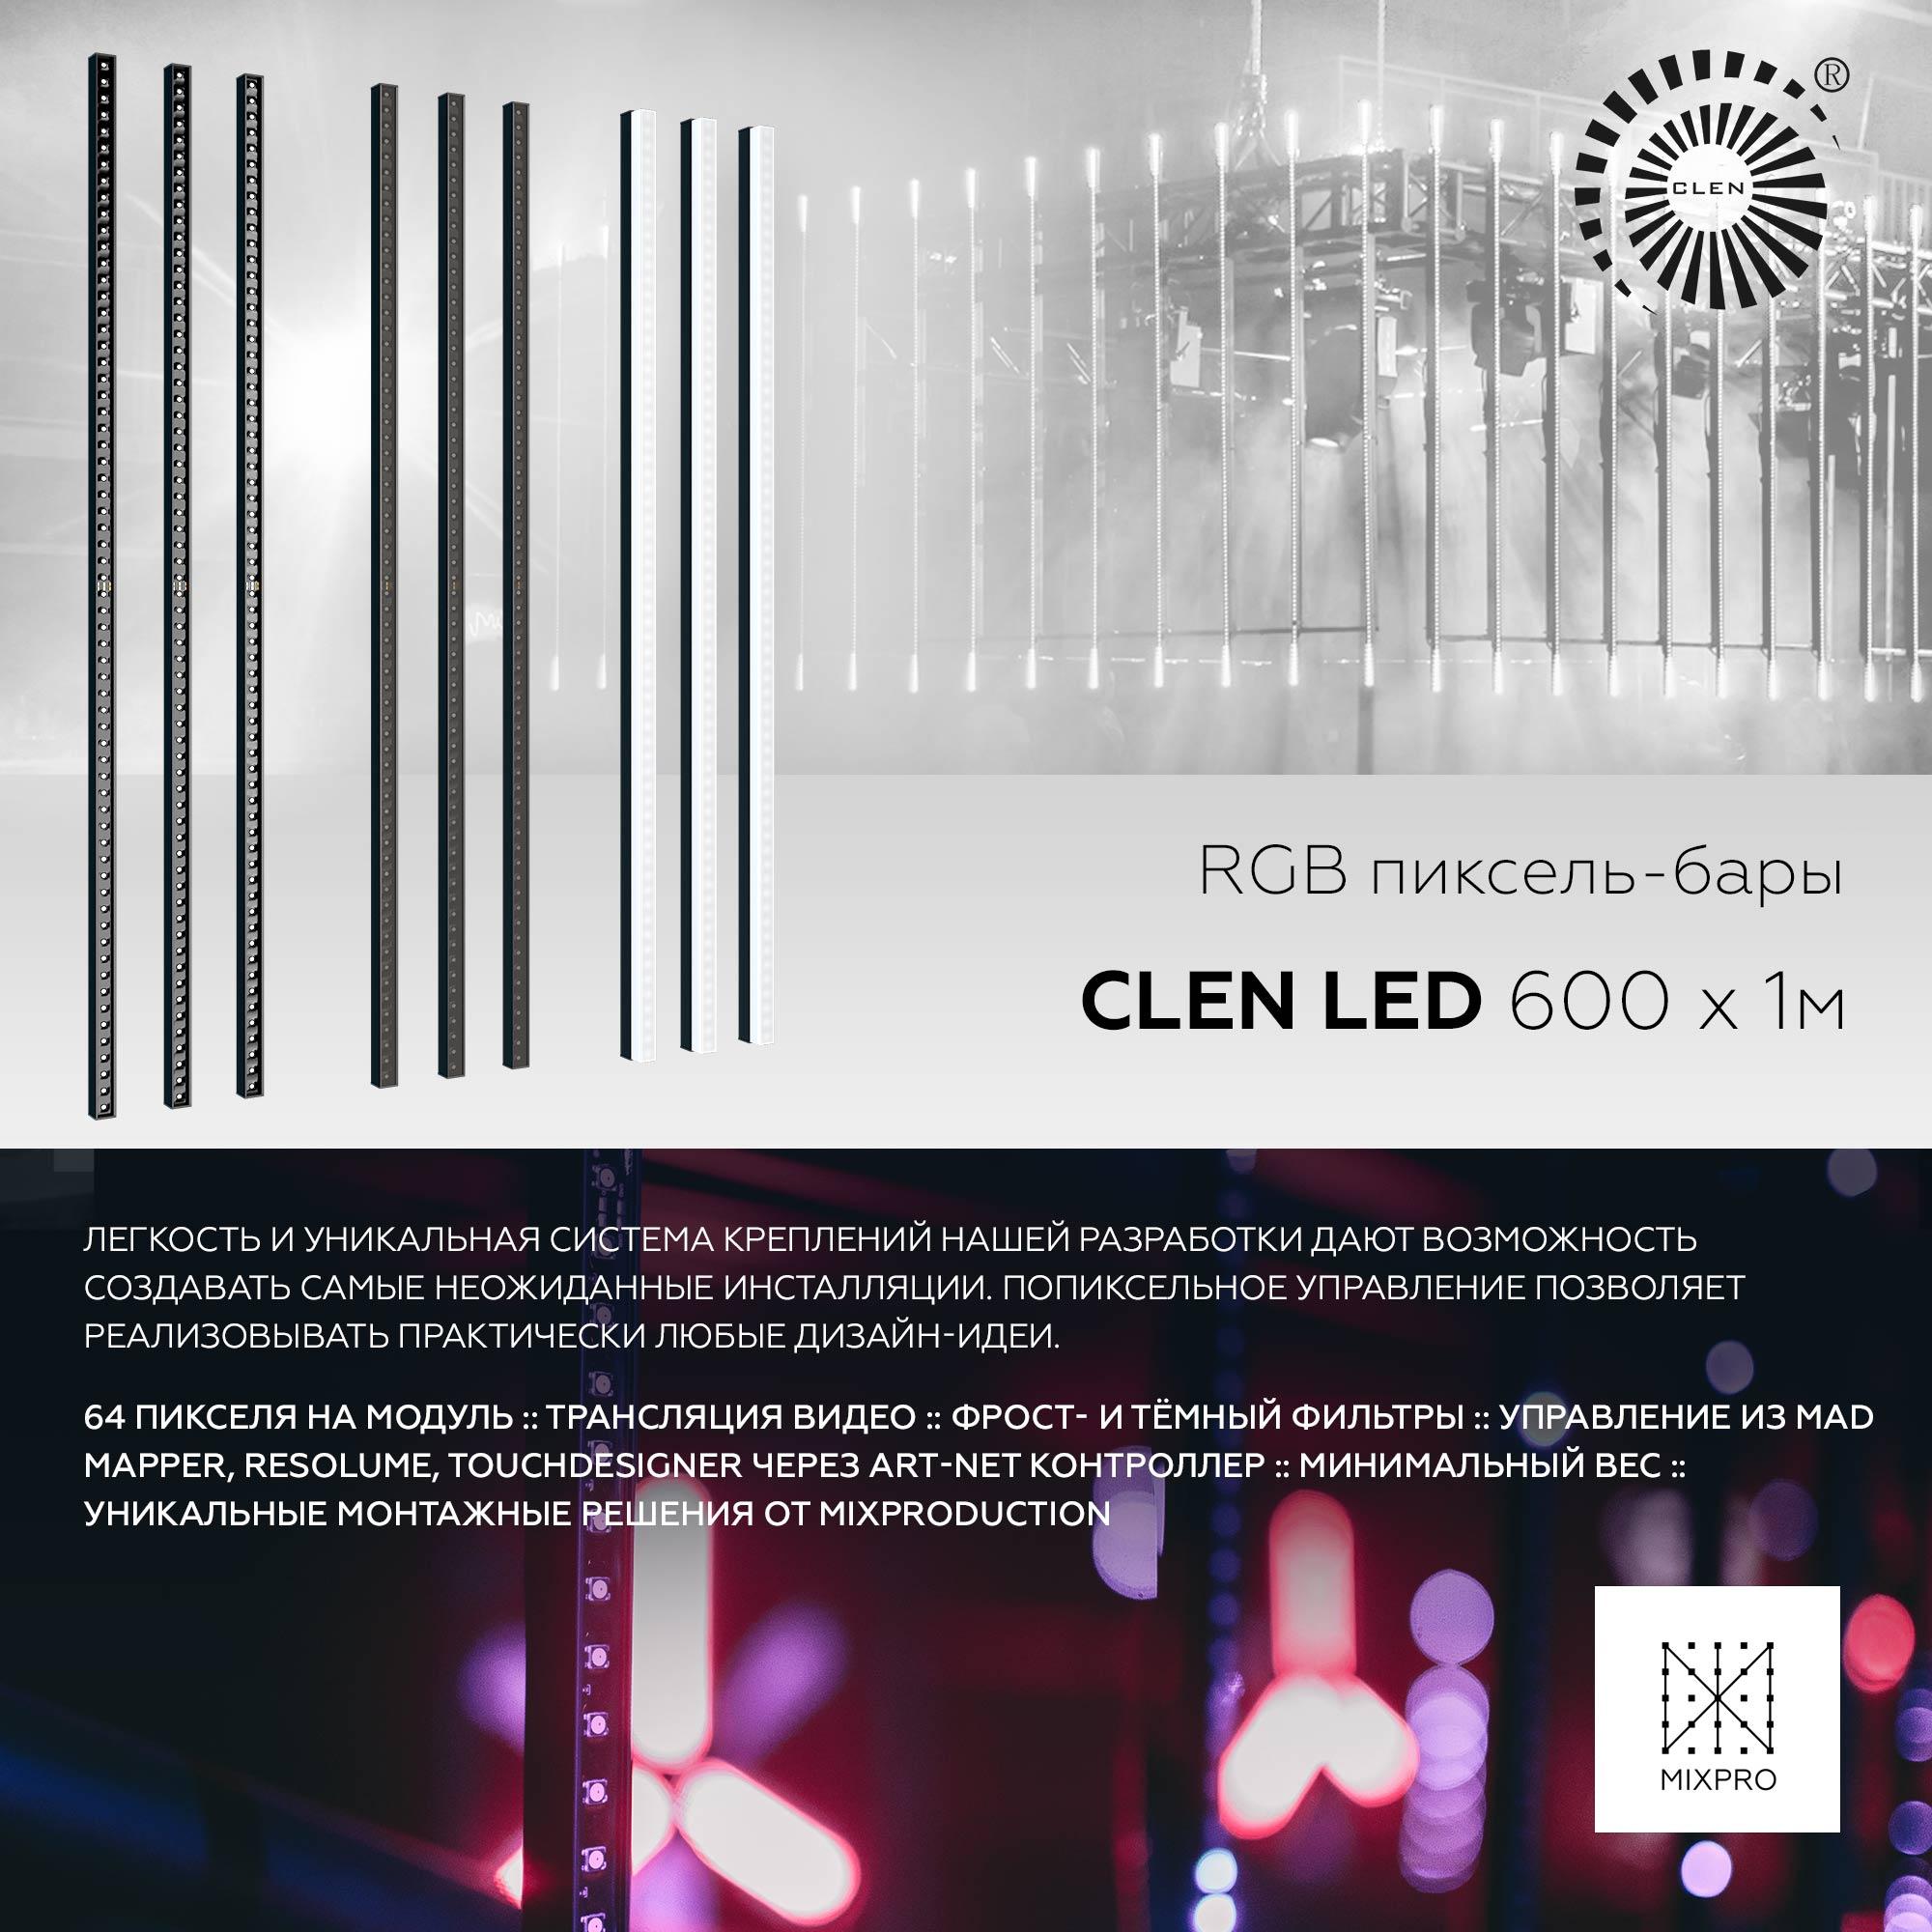 RGB пиксель-бары CLEN LED<br><br>